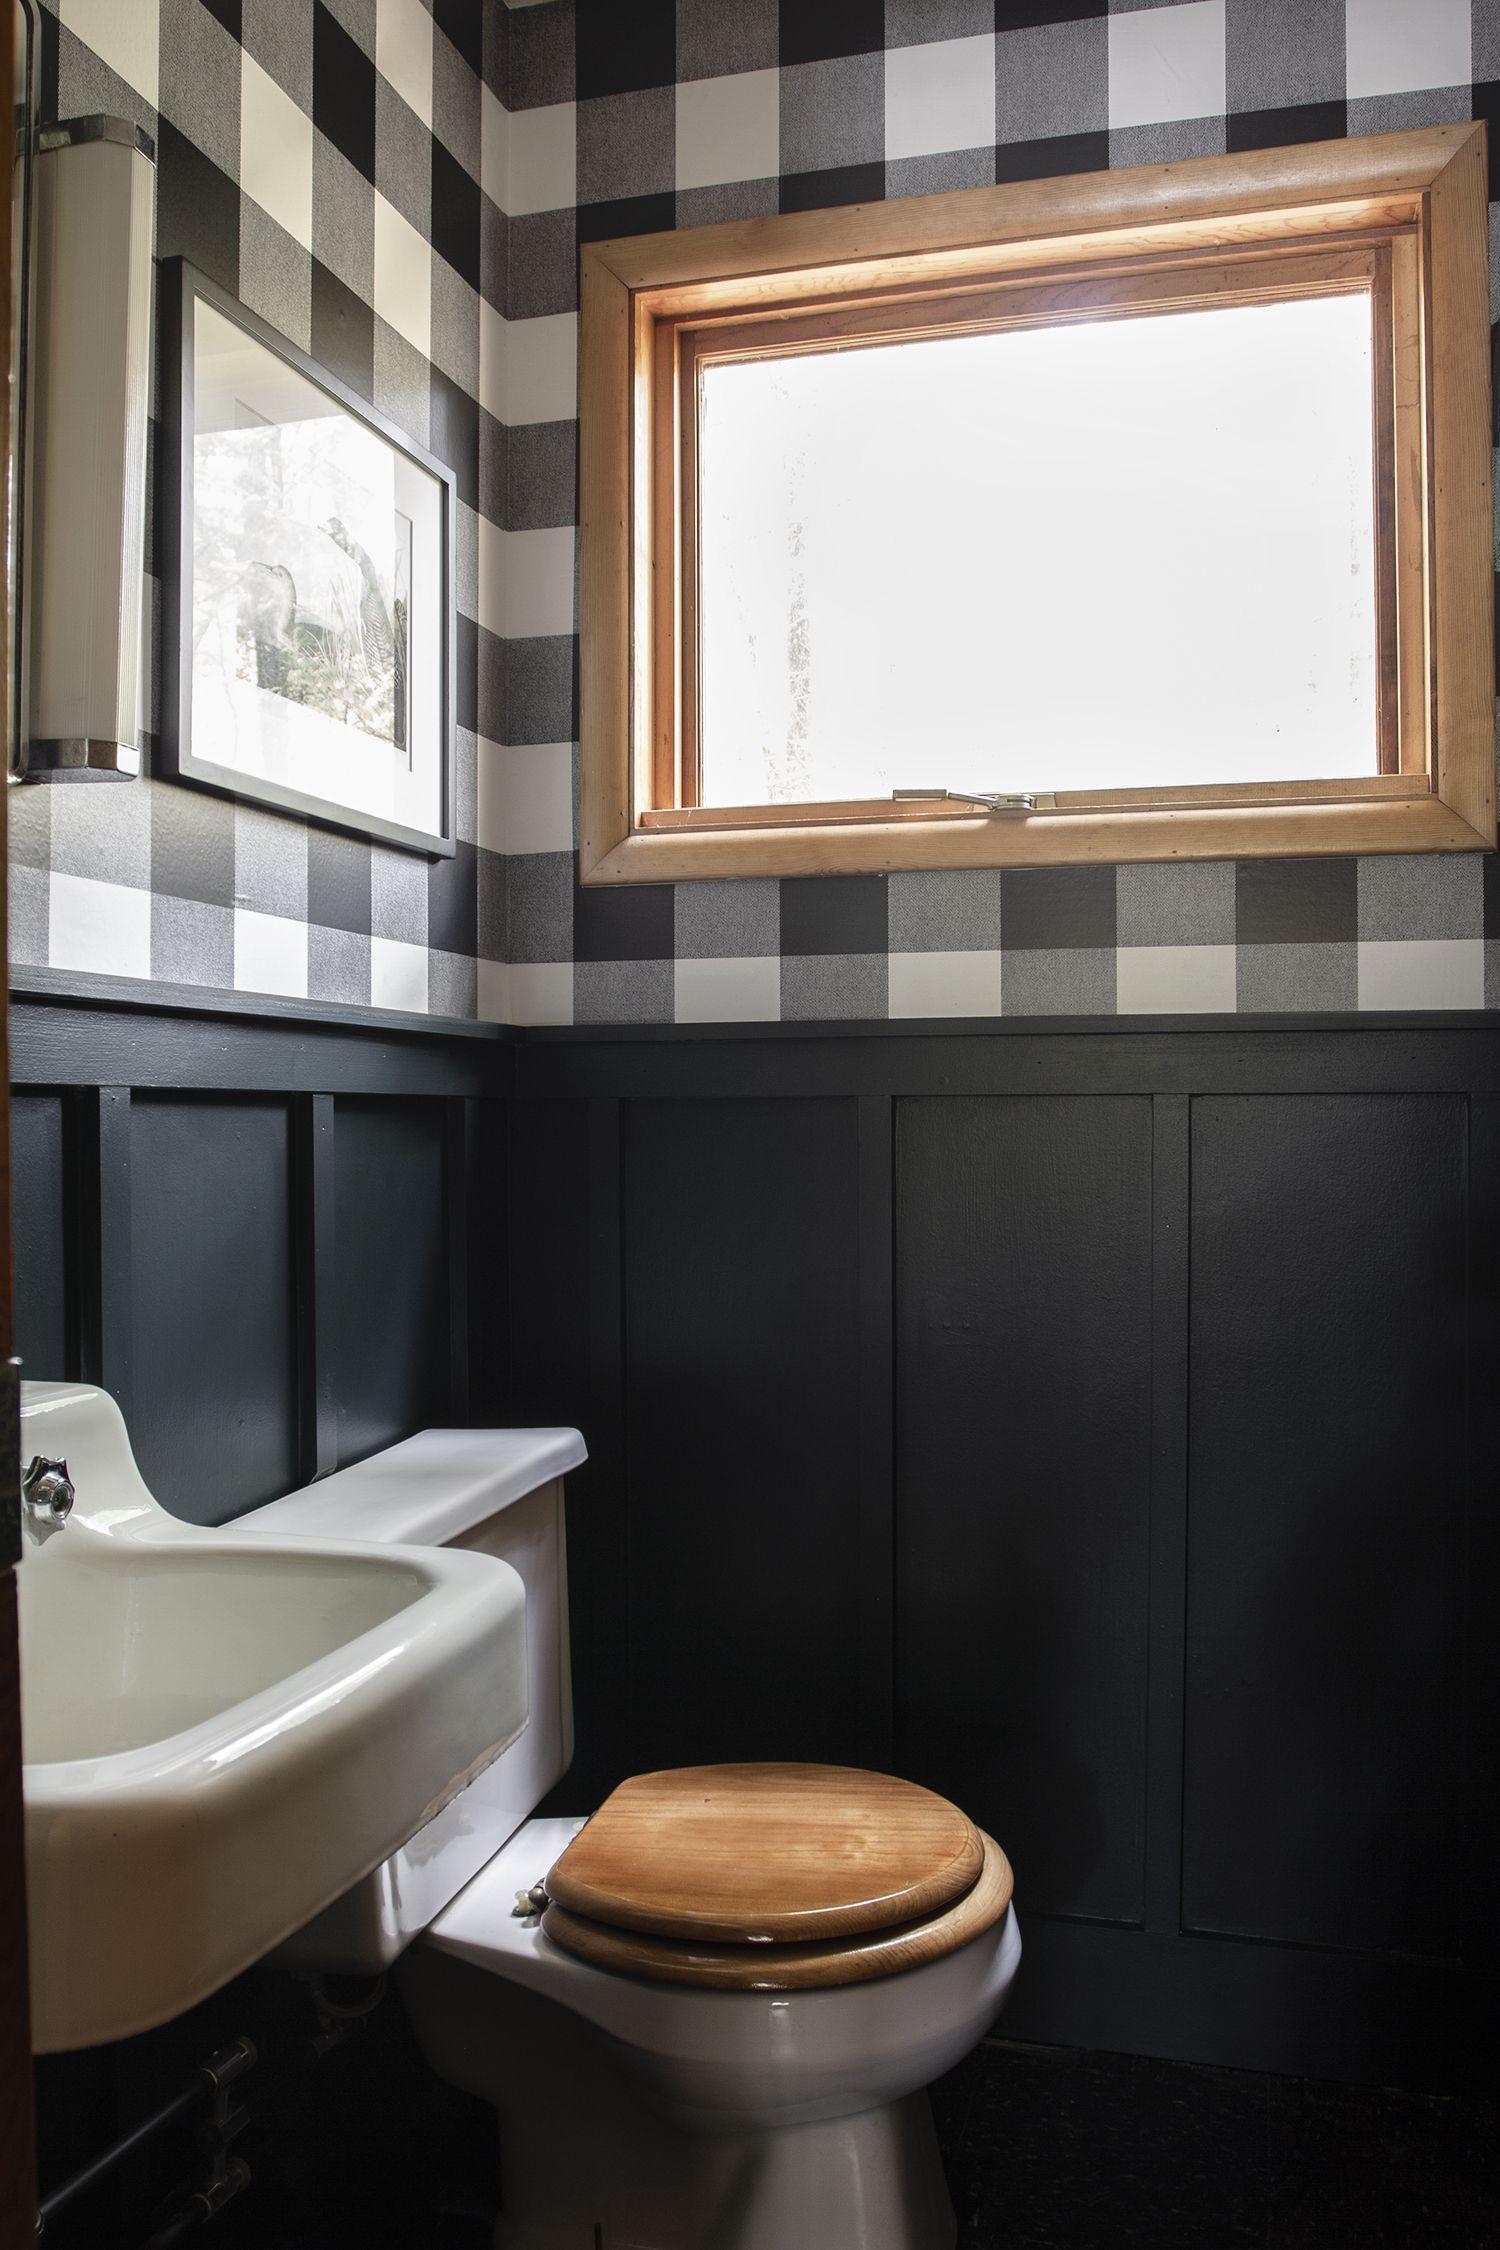 Progress Report : Cabin Half Bath -  Transforming a tiny Cabin Bathroom   Deuce Cities Henhouse  - #bath #cabin #cabindecor #diyhomedecorlighting #diyInteriordesign #Livingroomdecor #Progress #Report